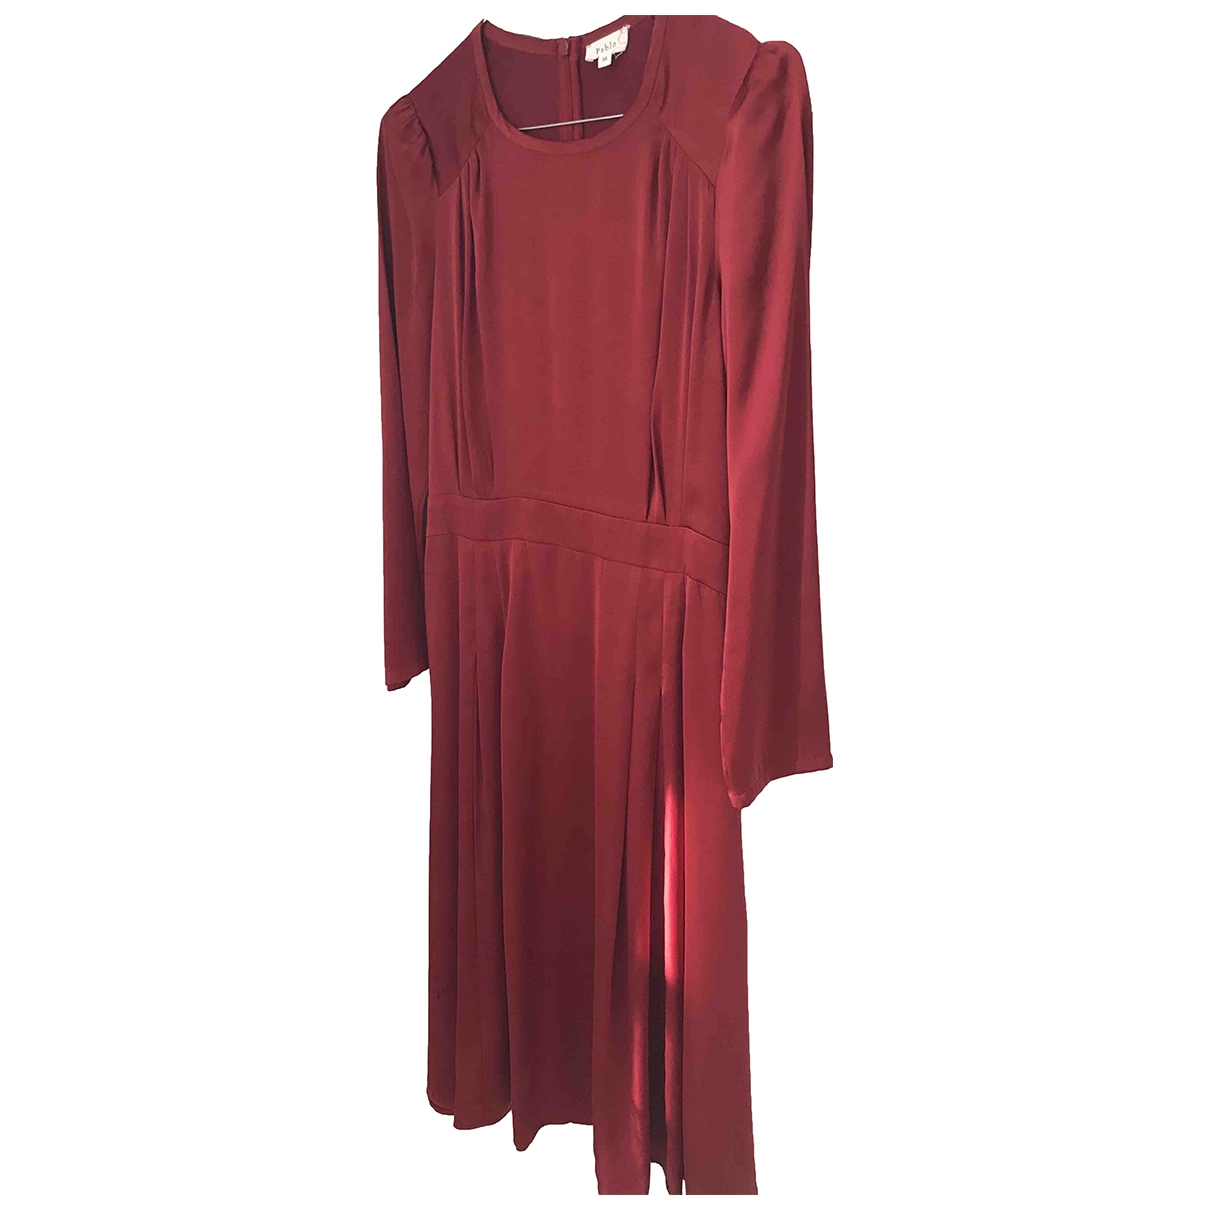 Pablo \N Kleid in  Bordeauxrot Polyester